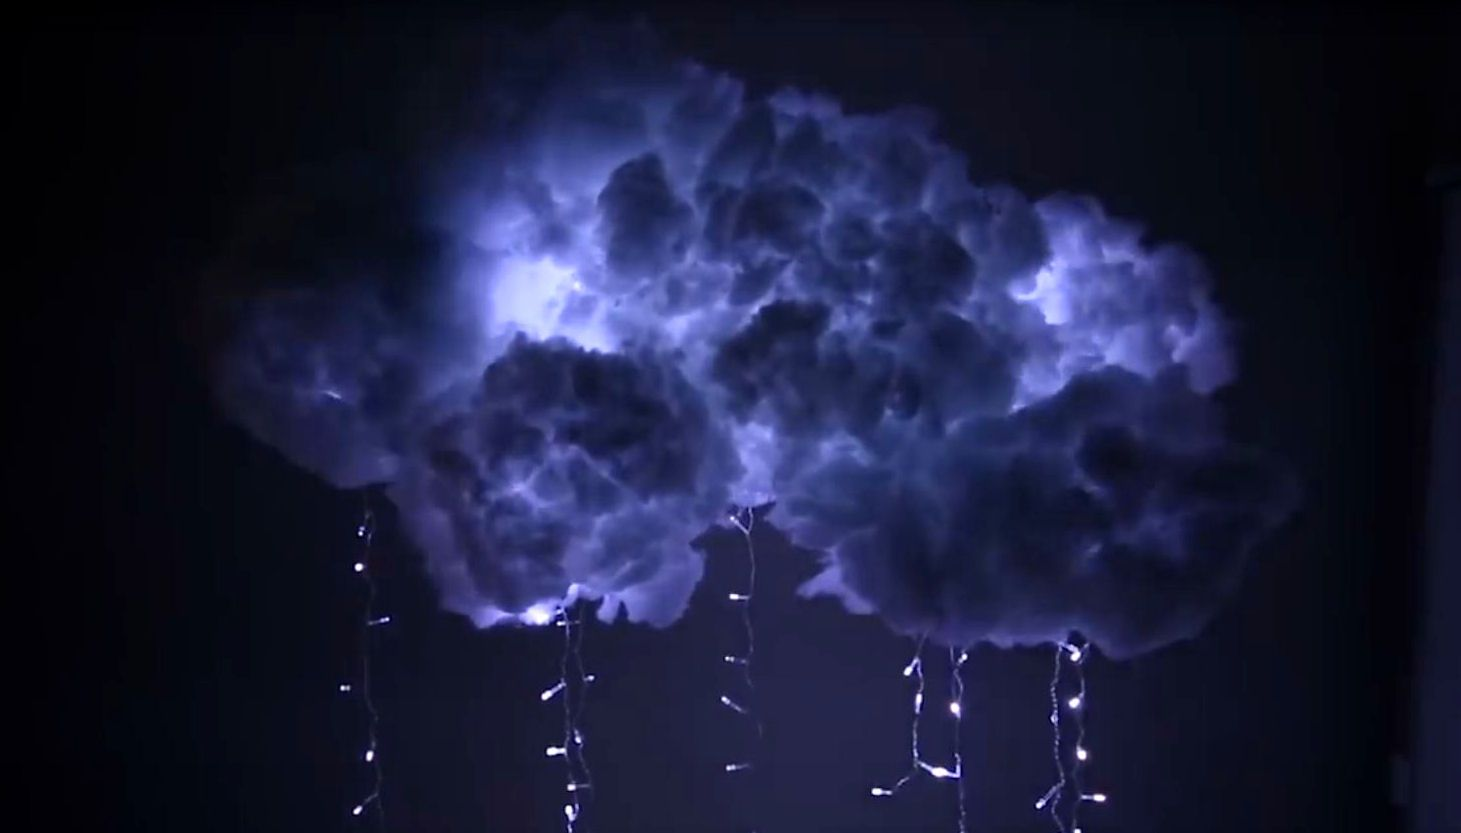 Diy project paper lantern cloud light thunder cloud